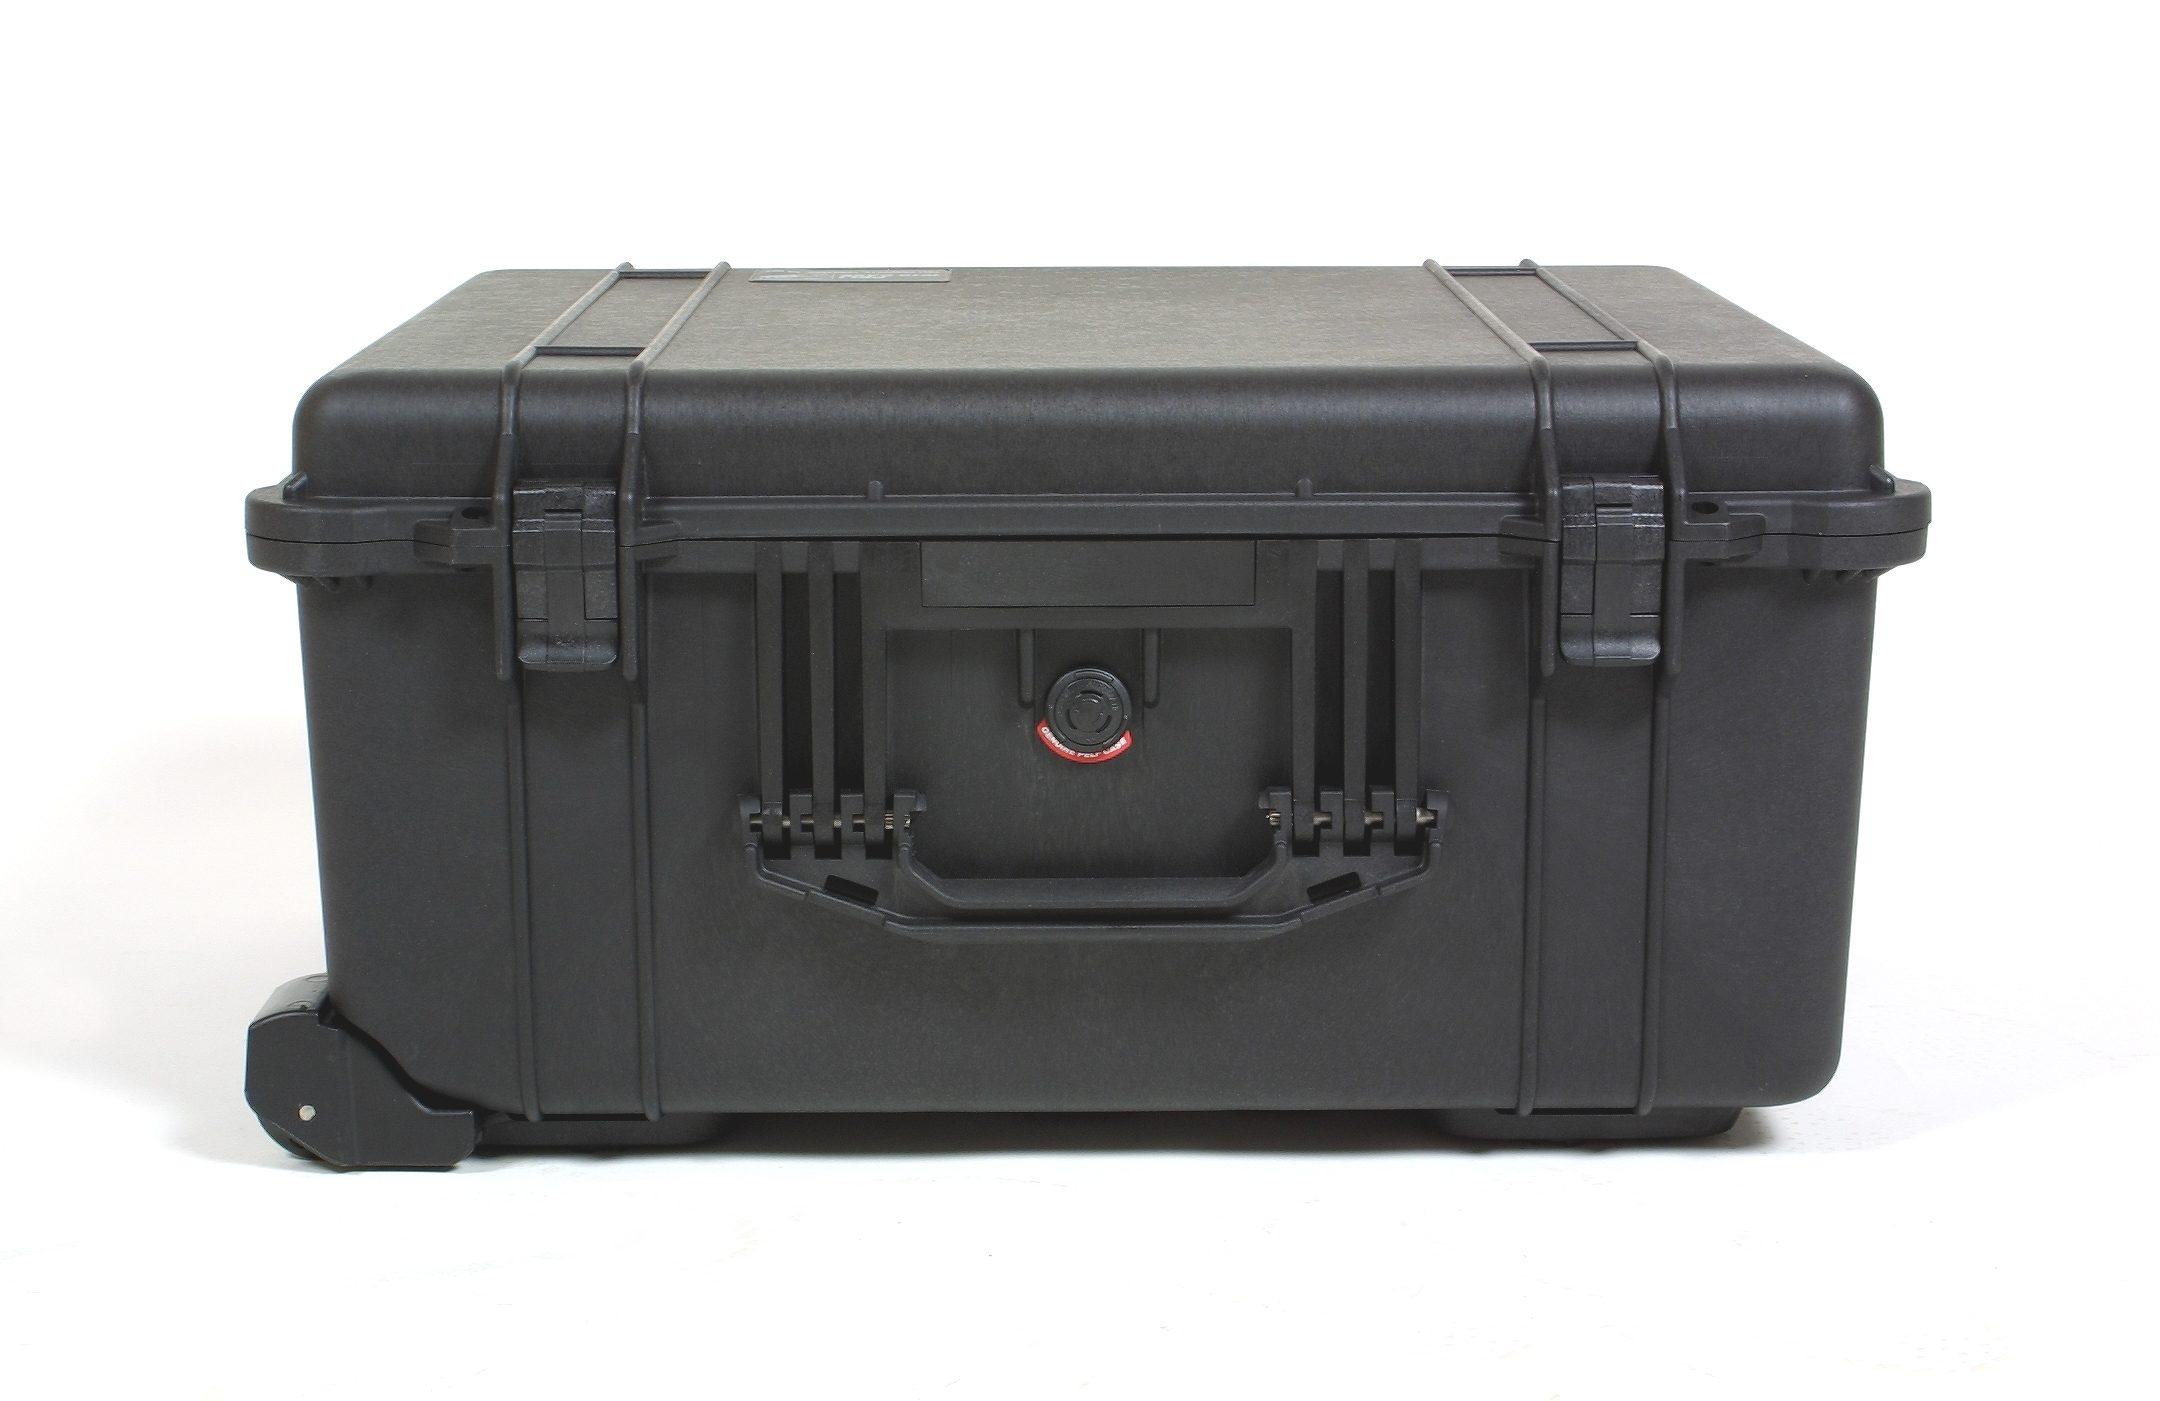 Peli Campingtruhe & -Kiste »1610 mit Schaumeinsatz«